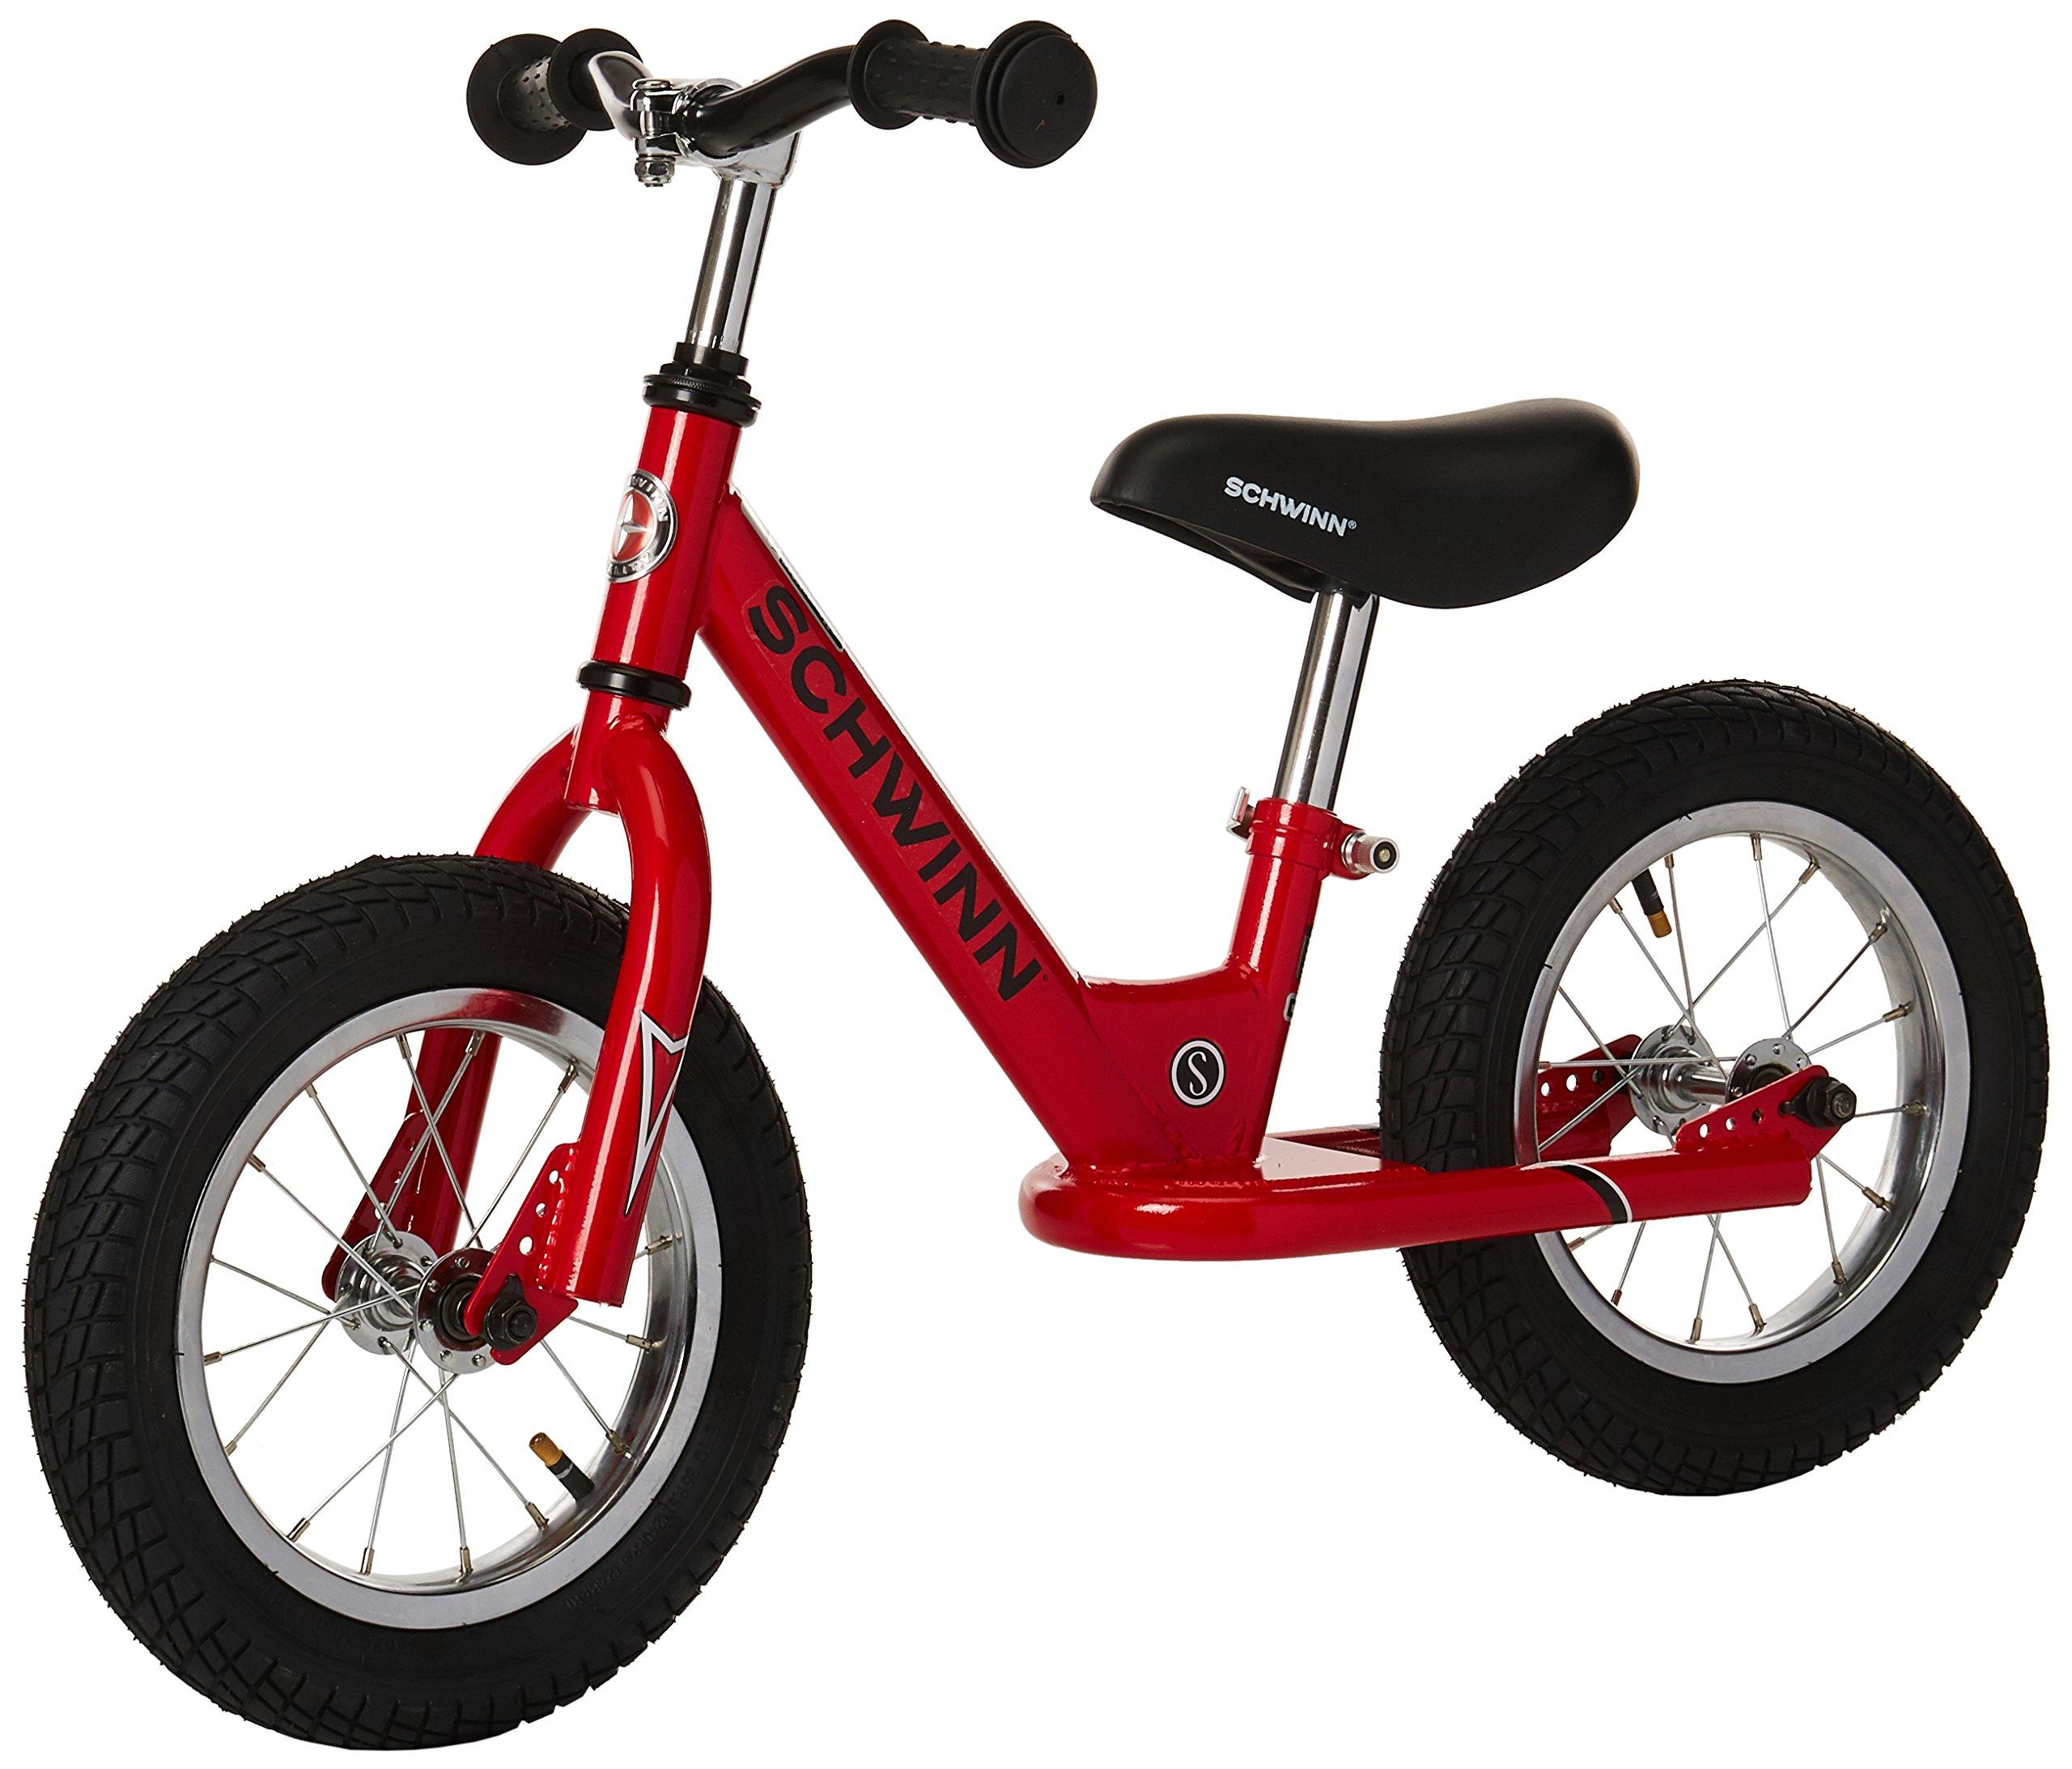 Schwinn Balance Bike, 12 inch wheel size, stride bike Ages 2-4 Red